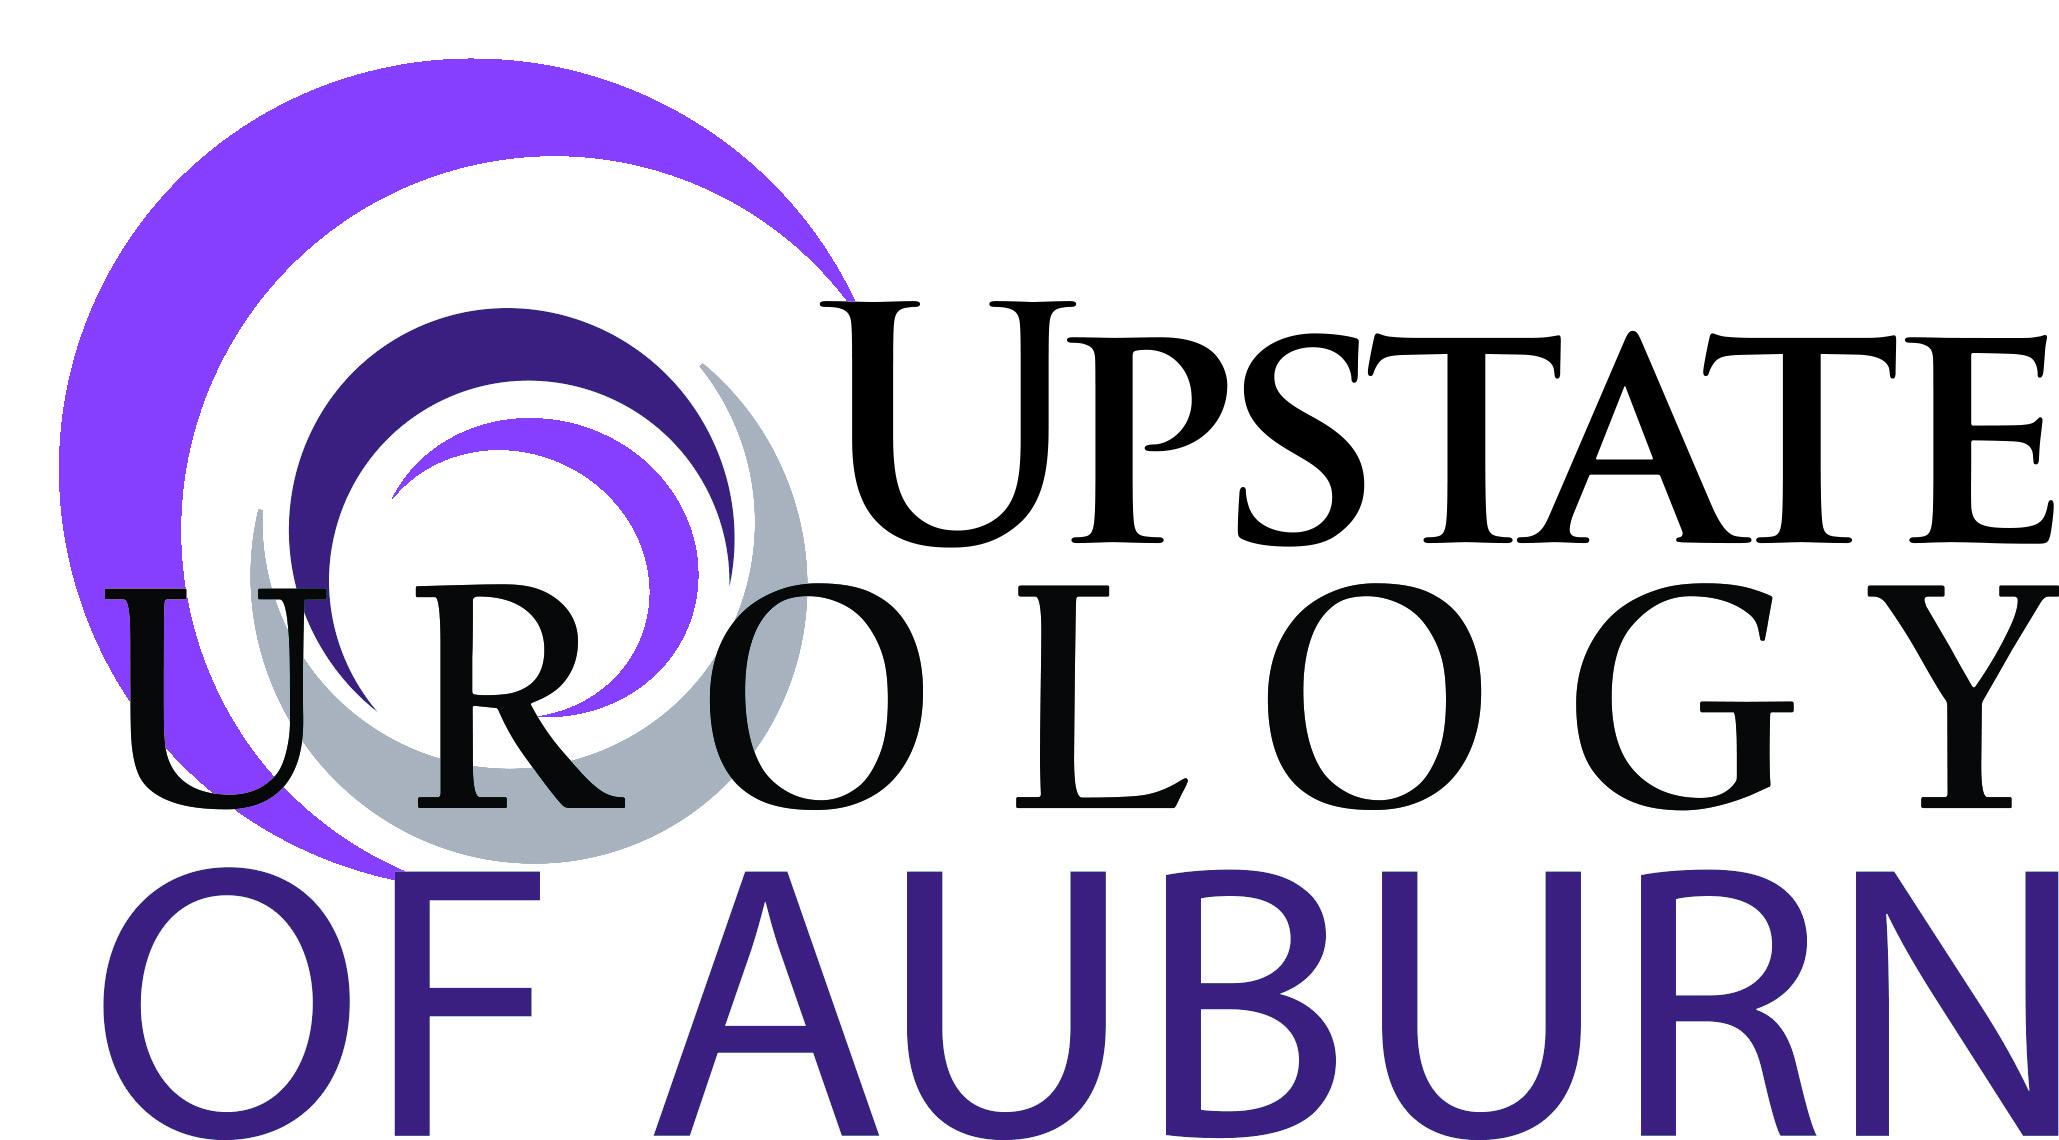 Upstate Urology